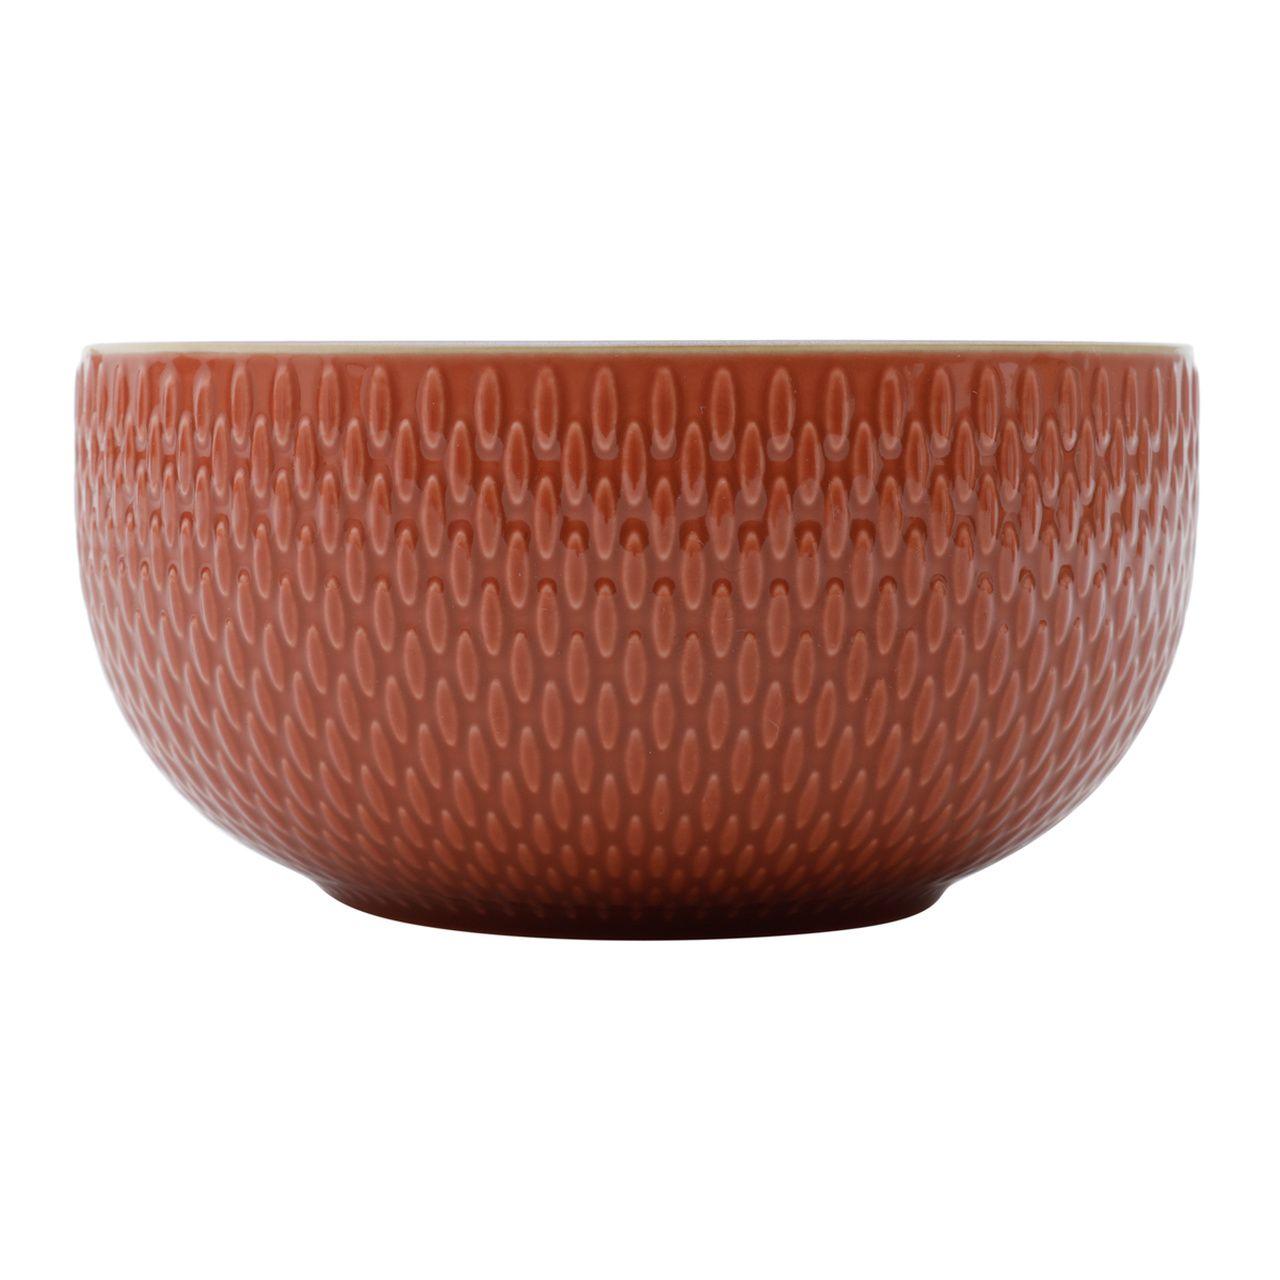 Jg 02 Bowls Laranja de Porcelana 700ml